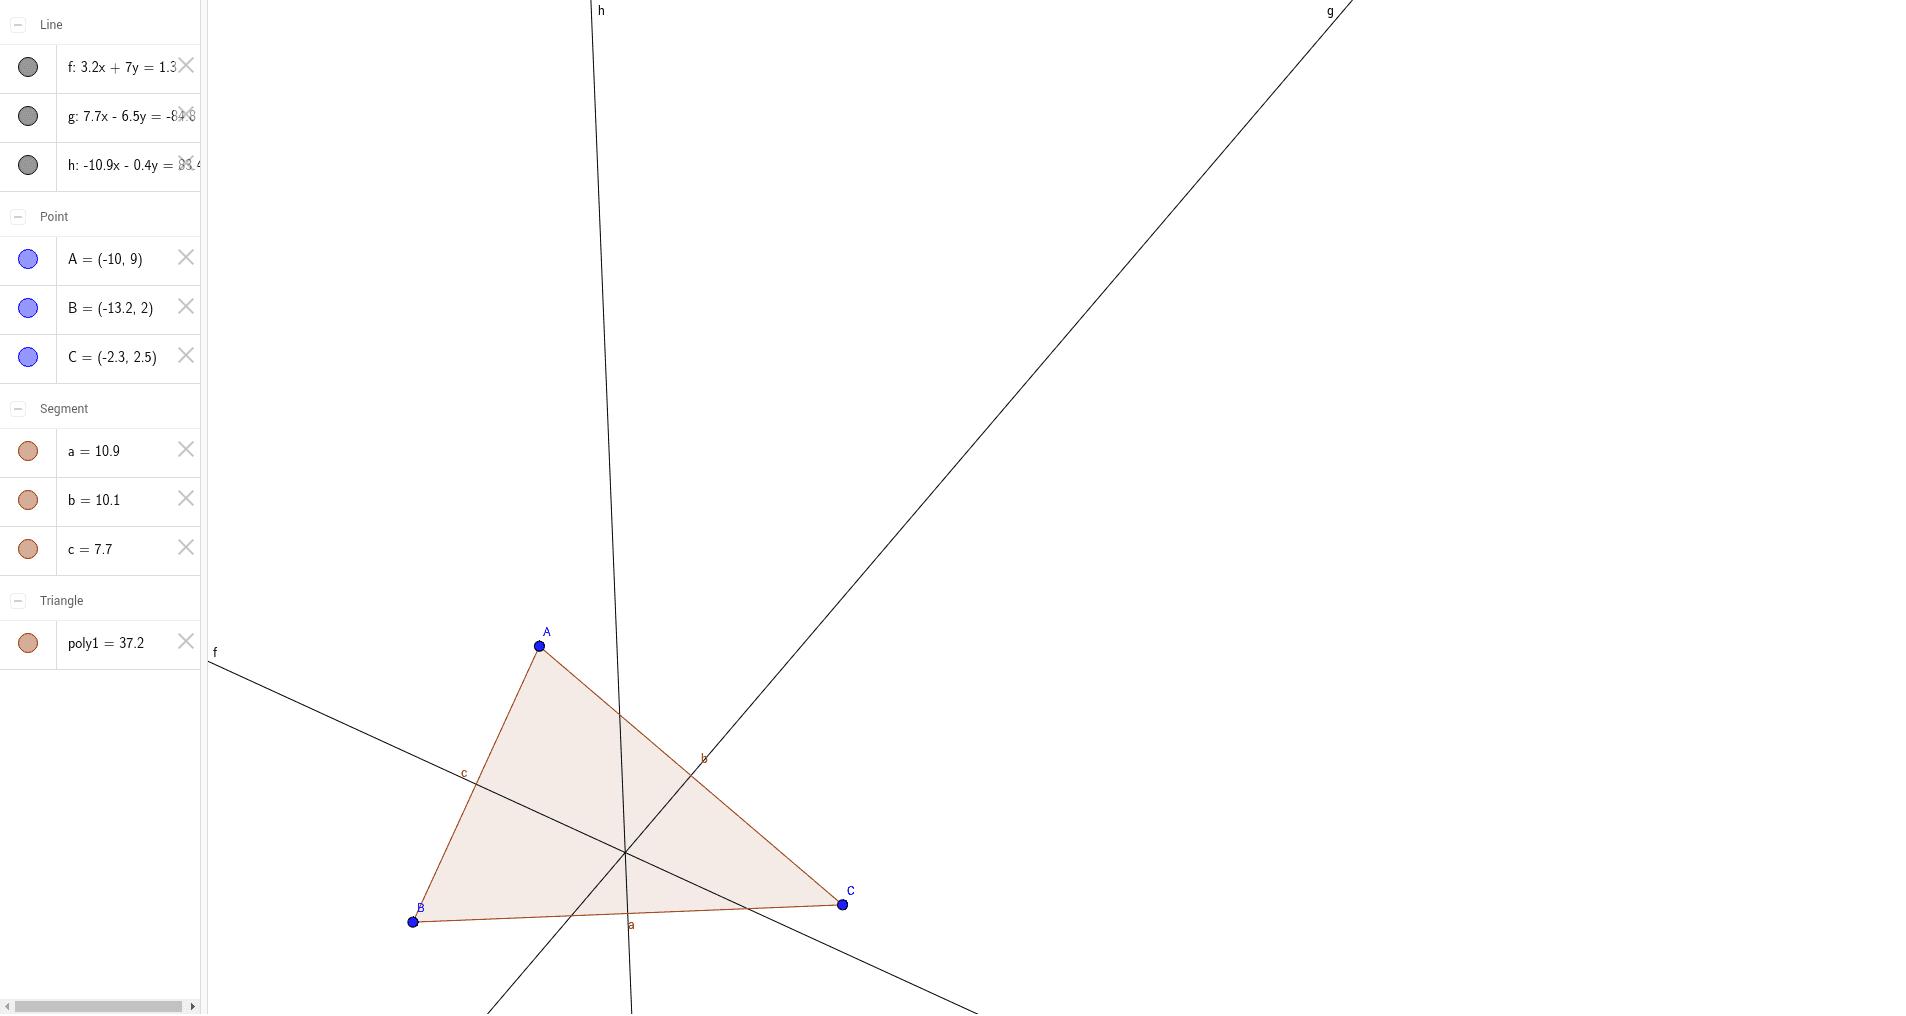 Médiatrices du triangle